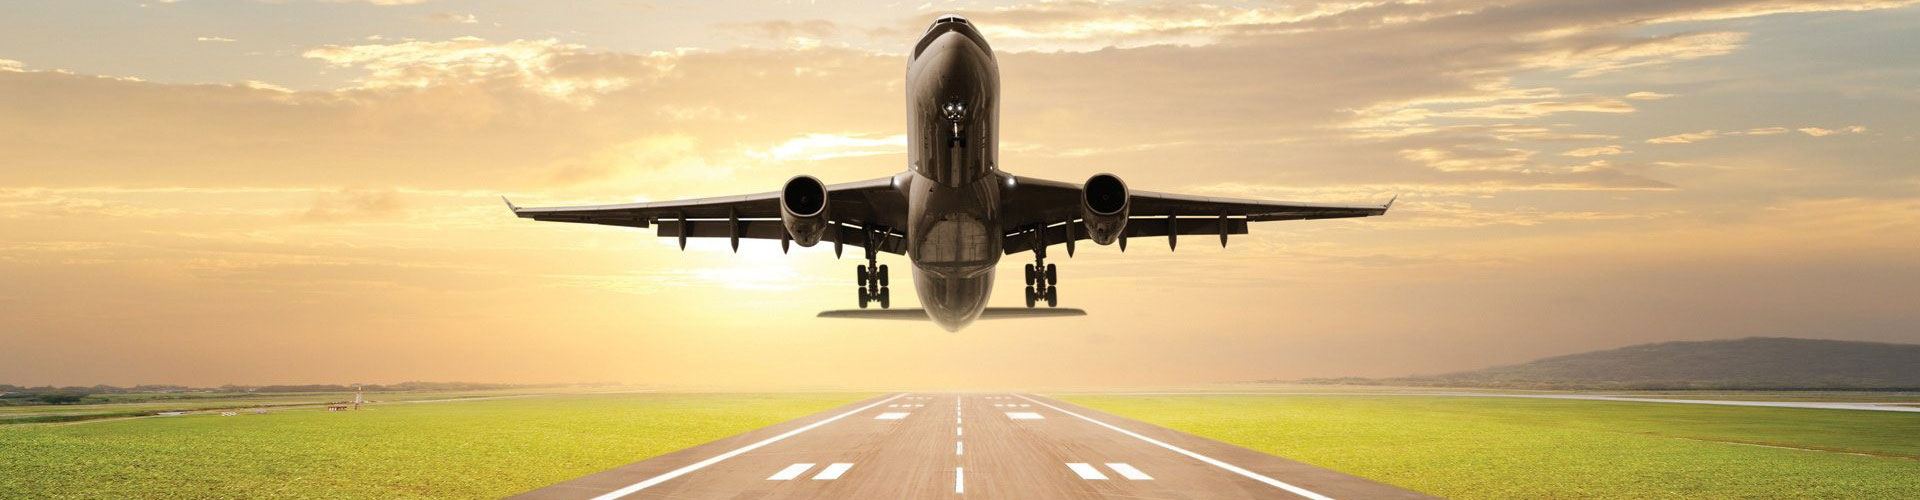 aeroplane-slide